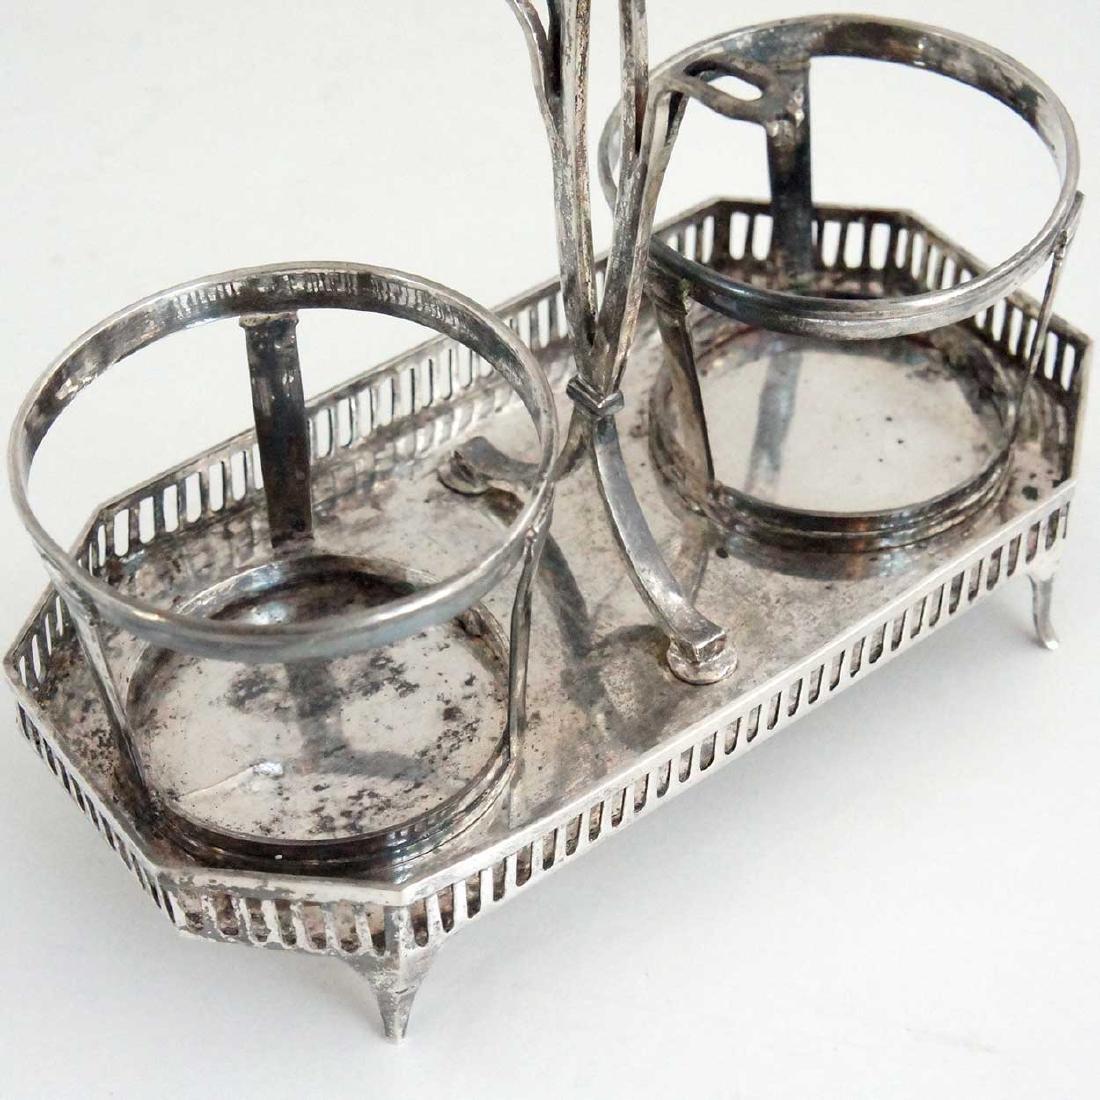 23 Antique Silver & Coin Silver Flatware & Cruet Stand - 4